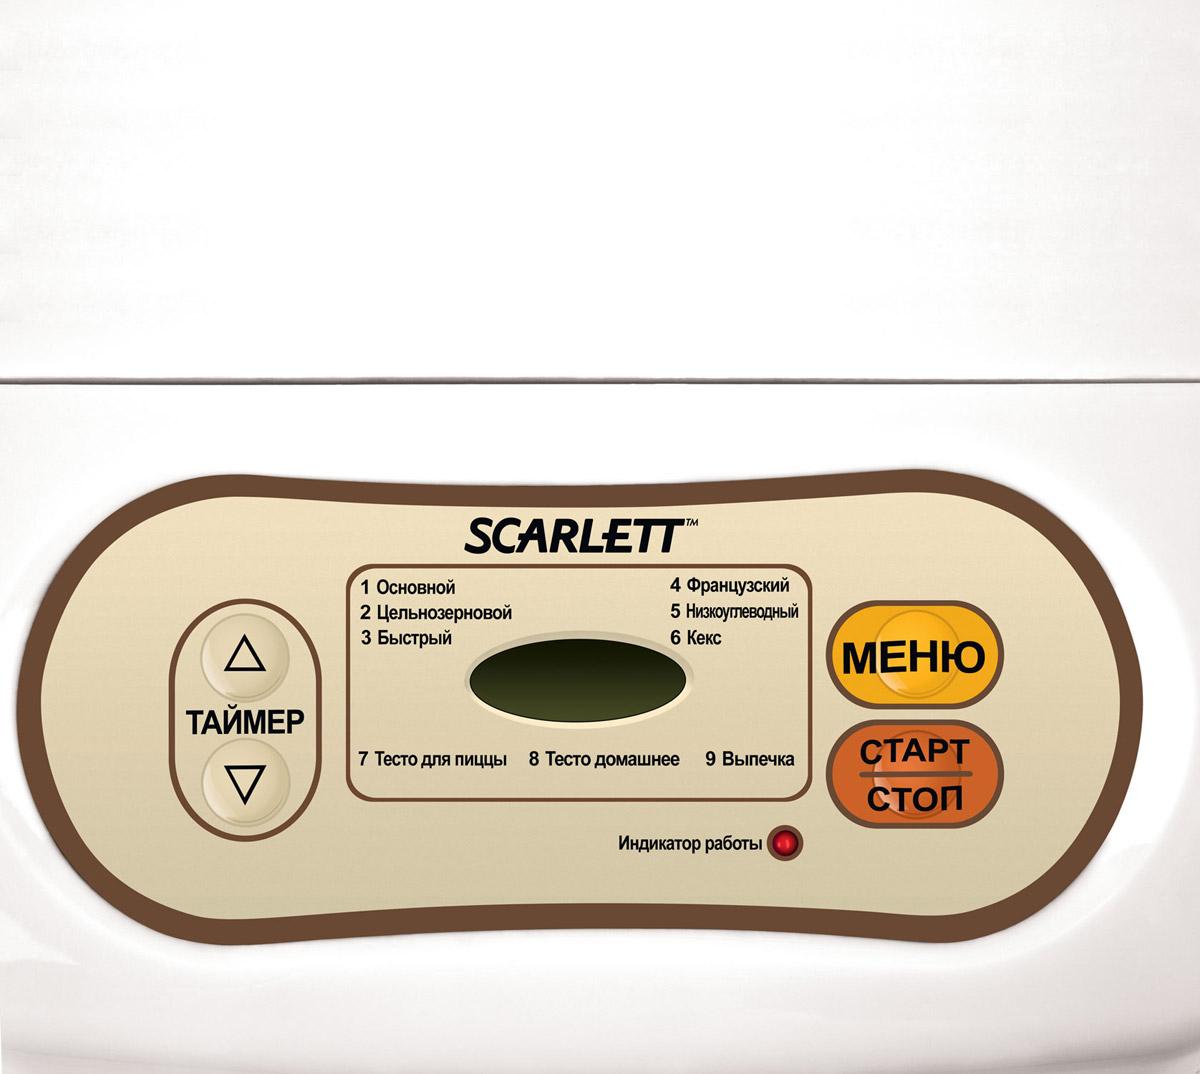 Scarlett SC-BM40002, White хлебопечь